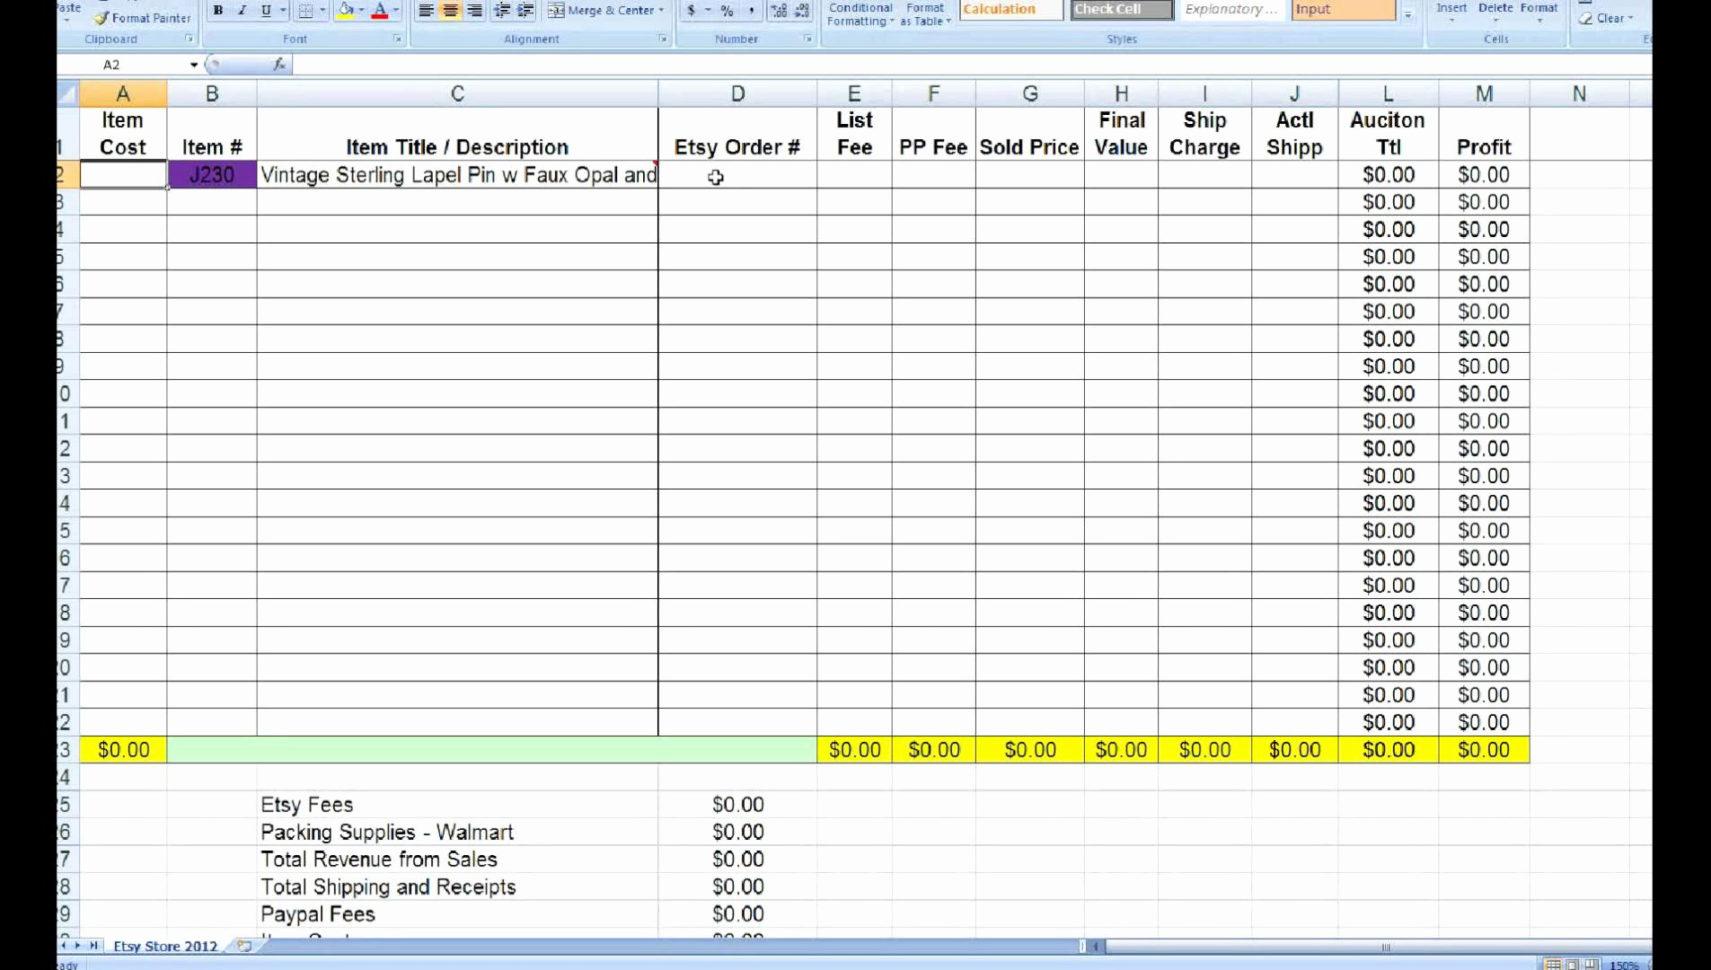 Spreadsheet Software Programs | Spreadsheet Collections Inside Spreadsheet Software Programs